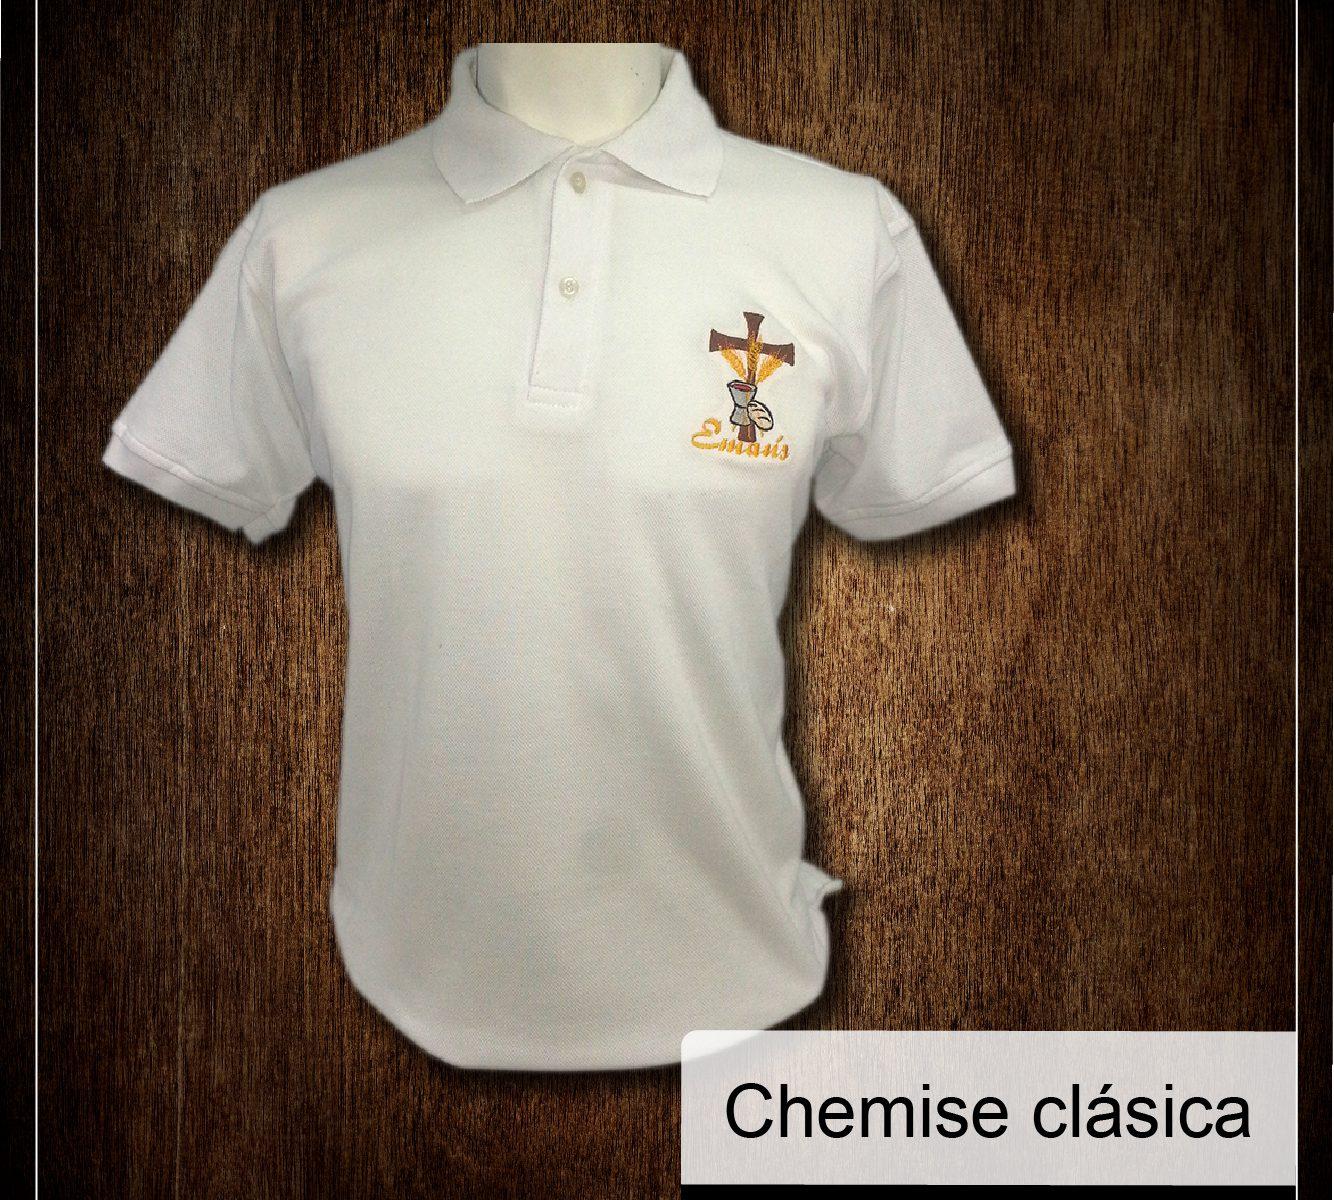 Emaus chemise